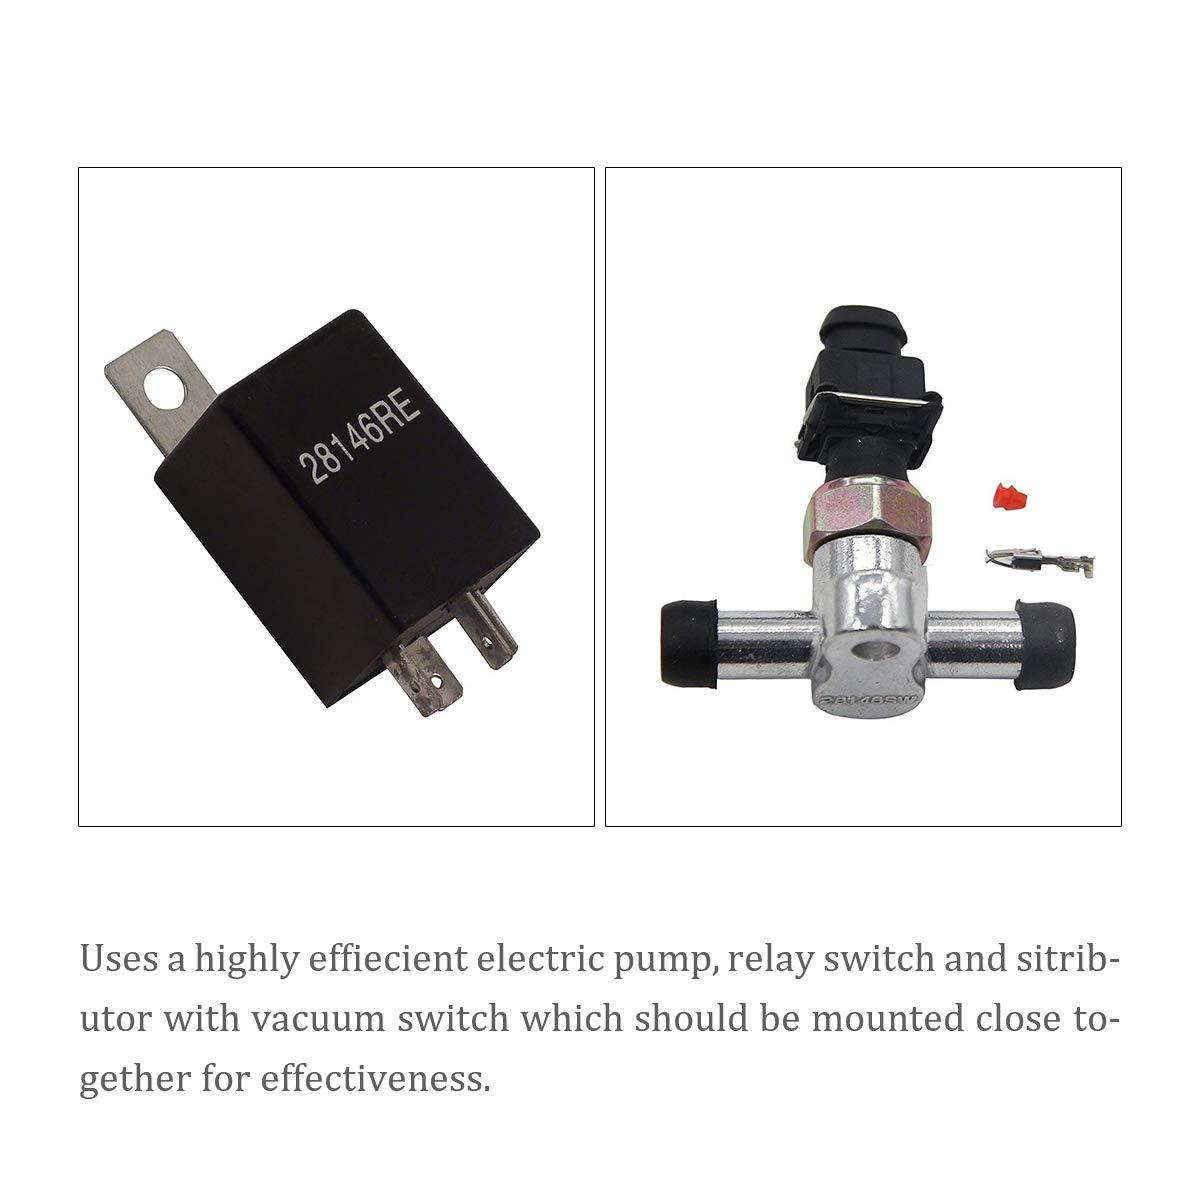 Dracarys 28146 Electric Vacuum Pump Kit For Brake Booster Vacuum Pump Electric Vacuum Pump For Brakes